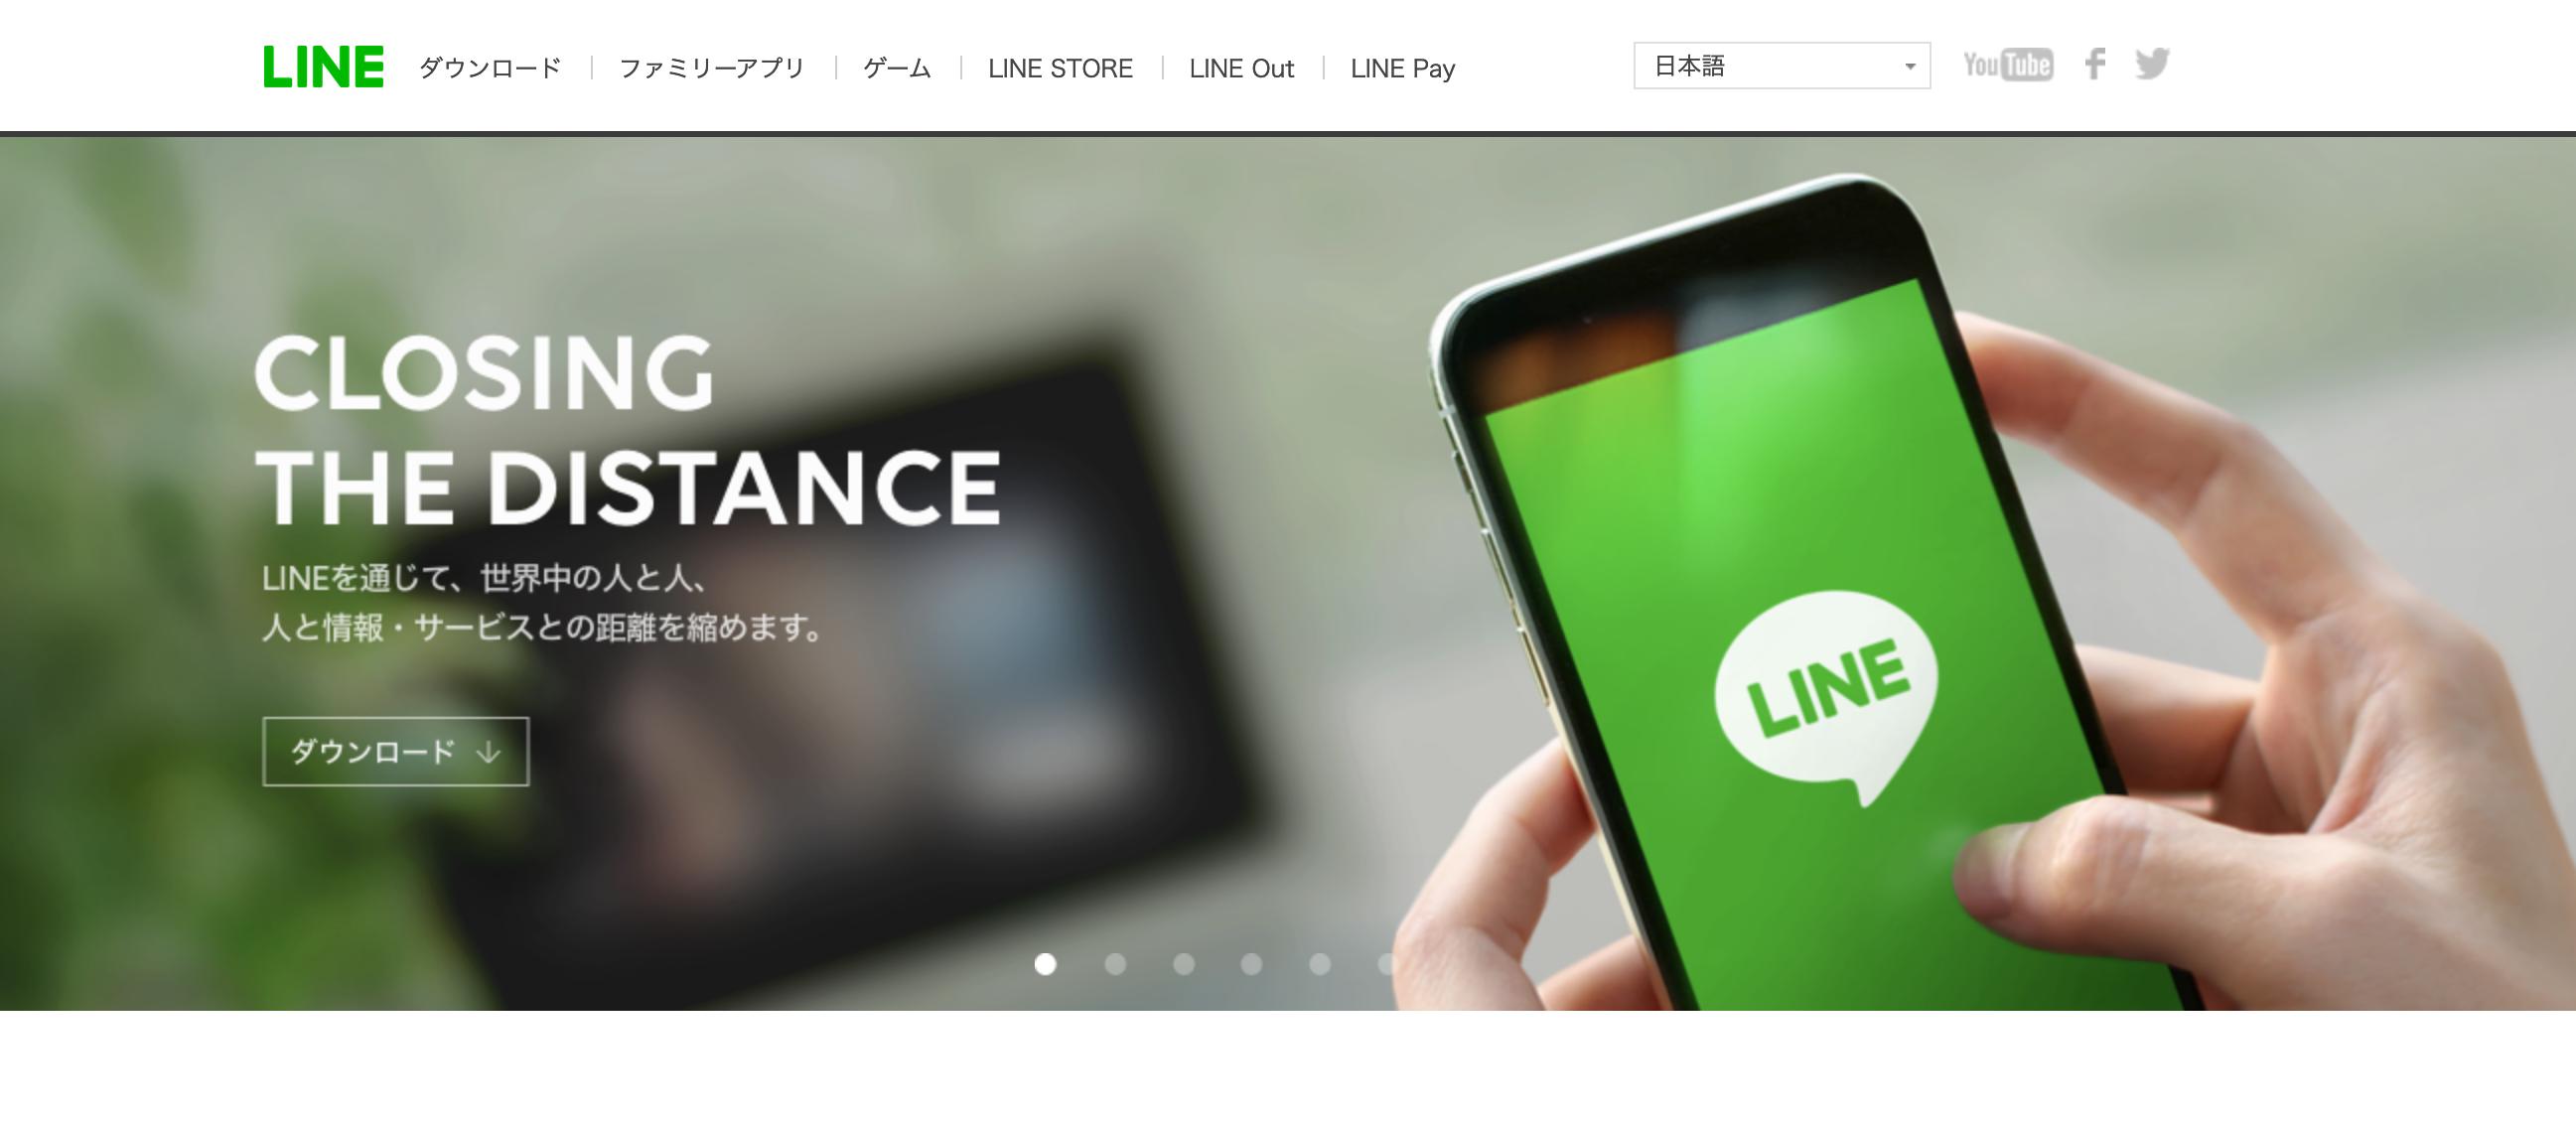 LINEを利用したマーケティングの特徴